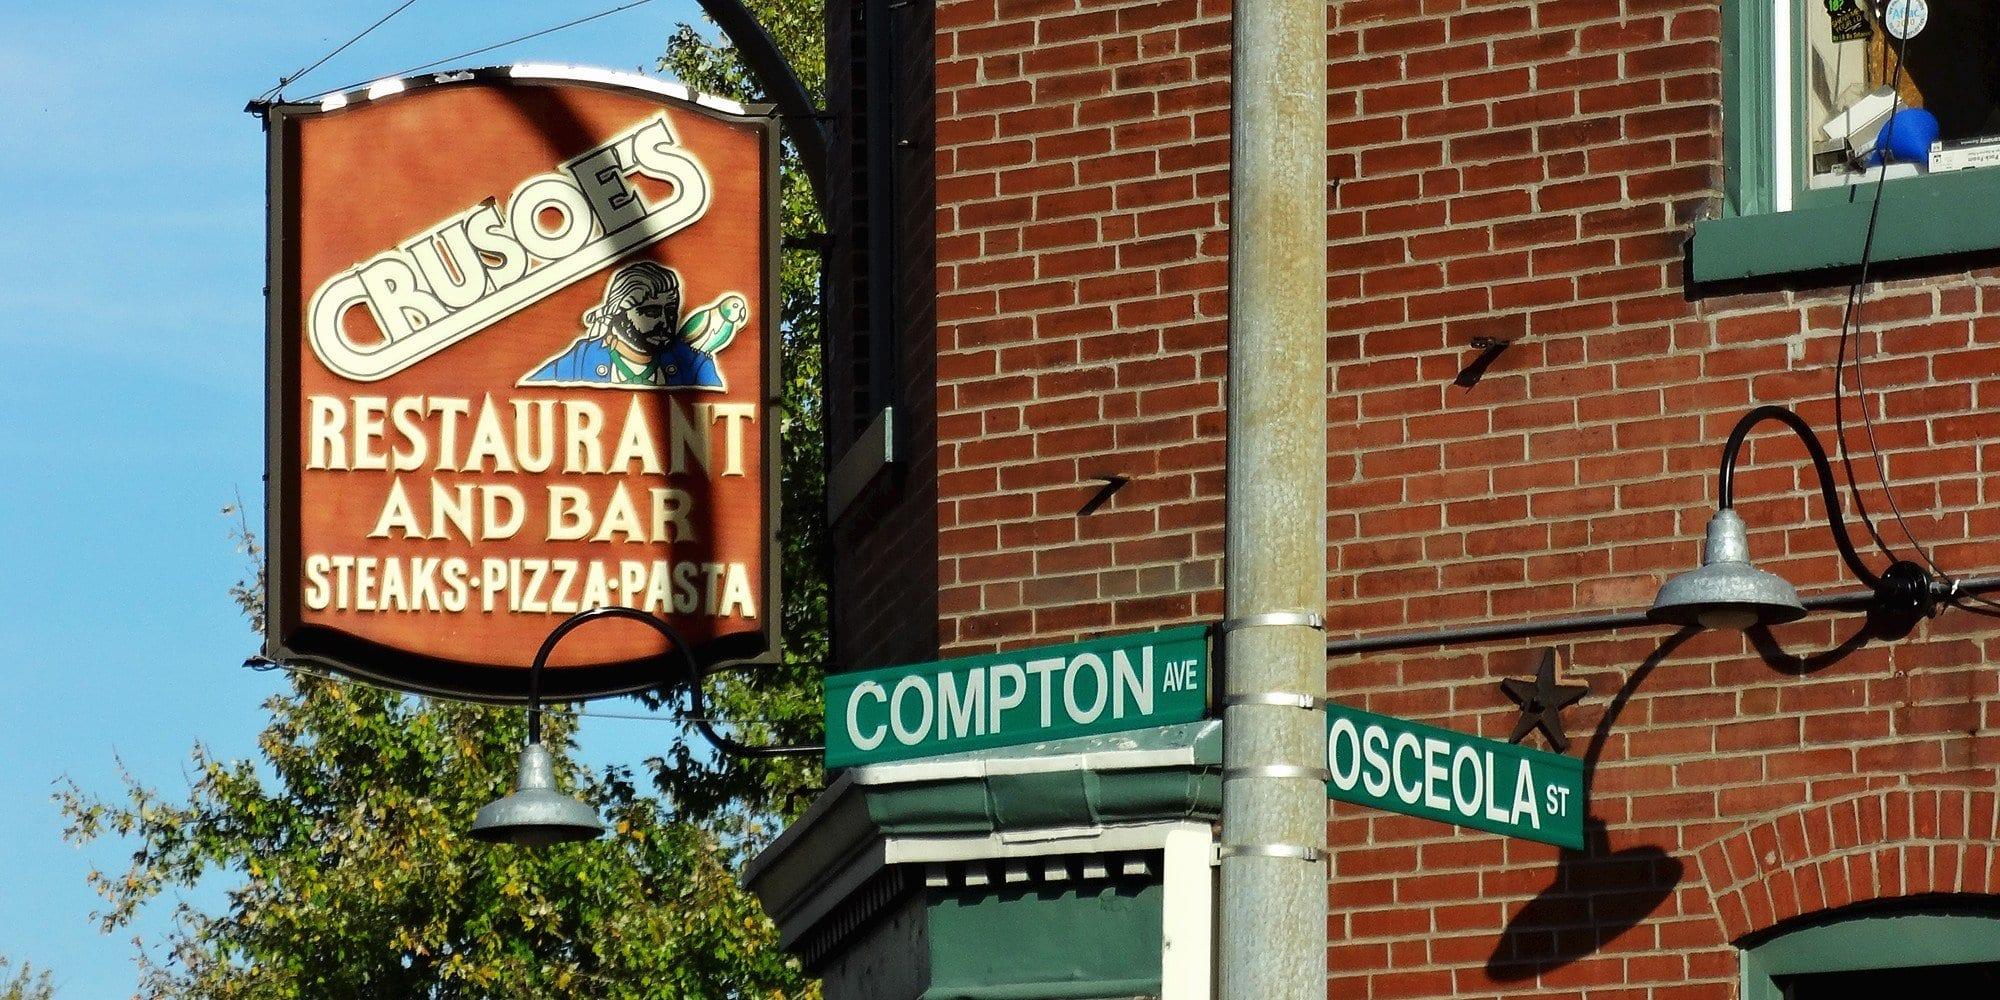 The Original Crusoe's Restaurant. Photo by Paul Sableman.